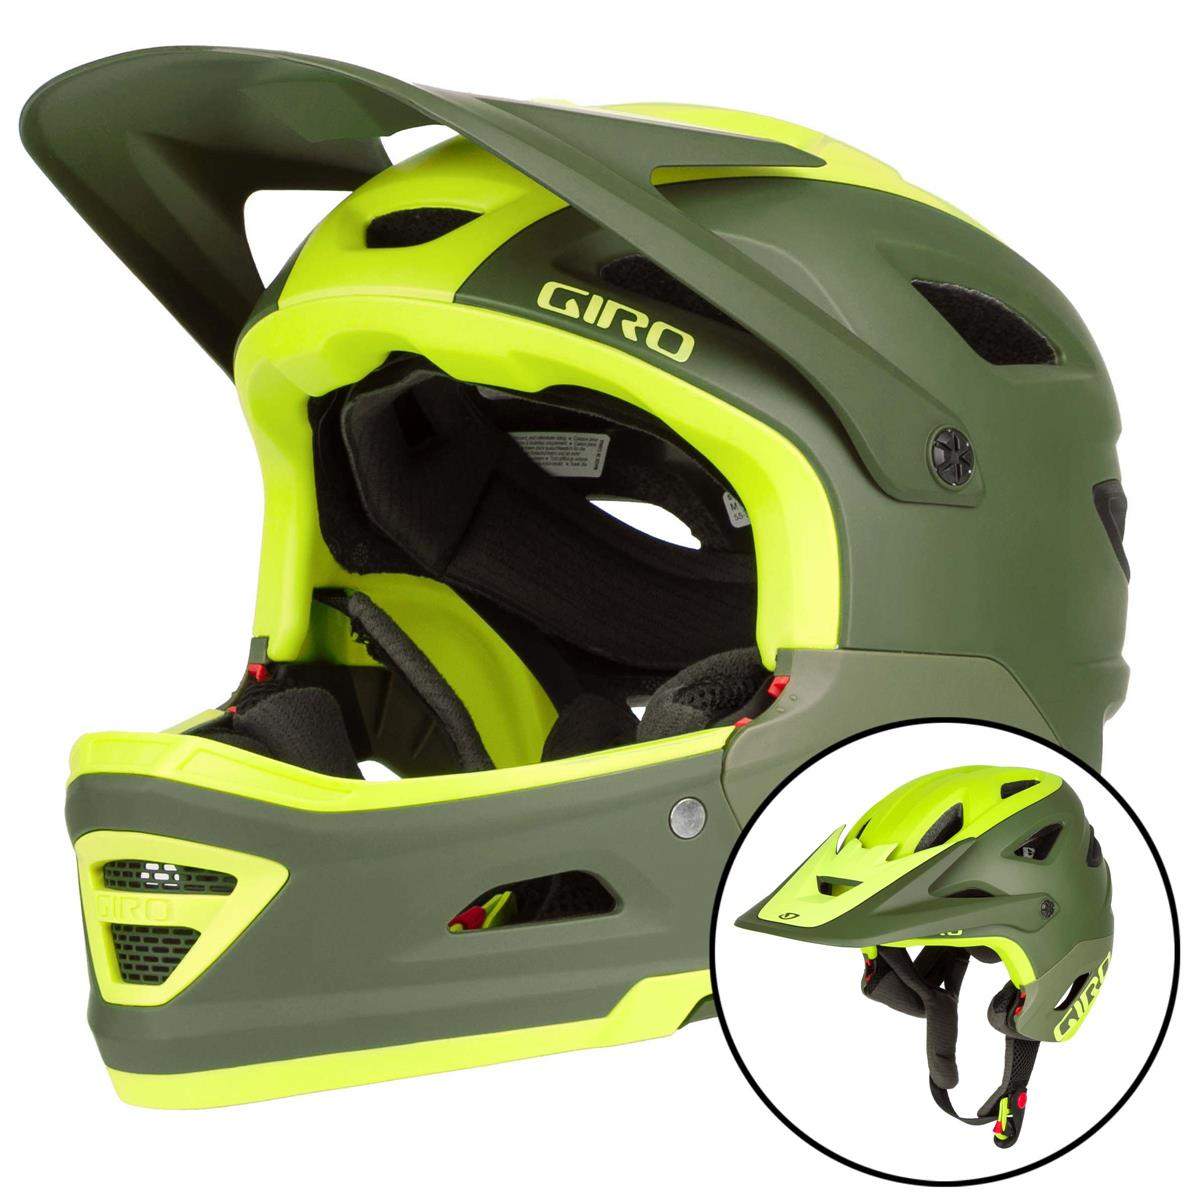 Giro Downhill-MTB Helm Switchblade MIPS Matt Citron/Oliv